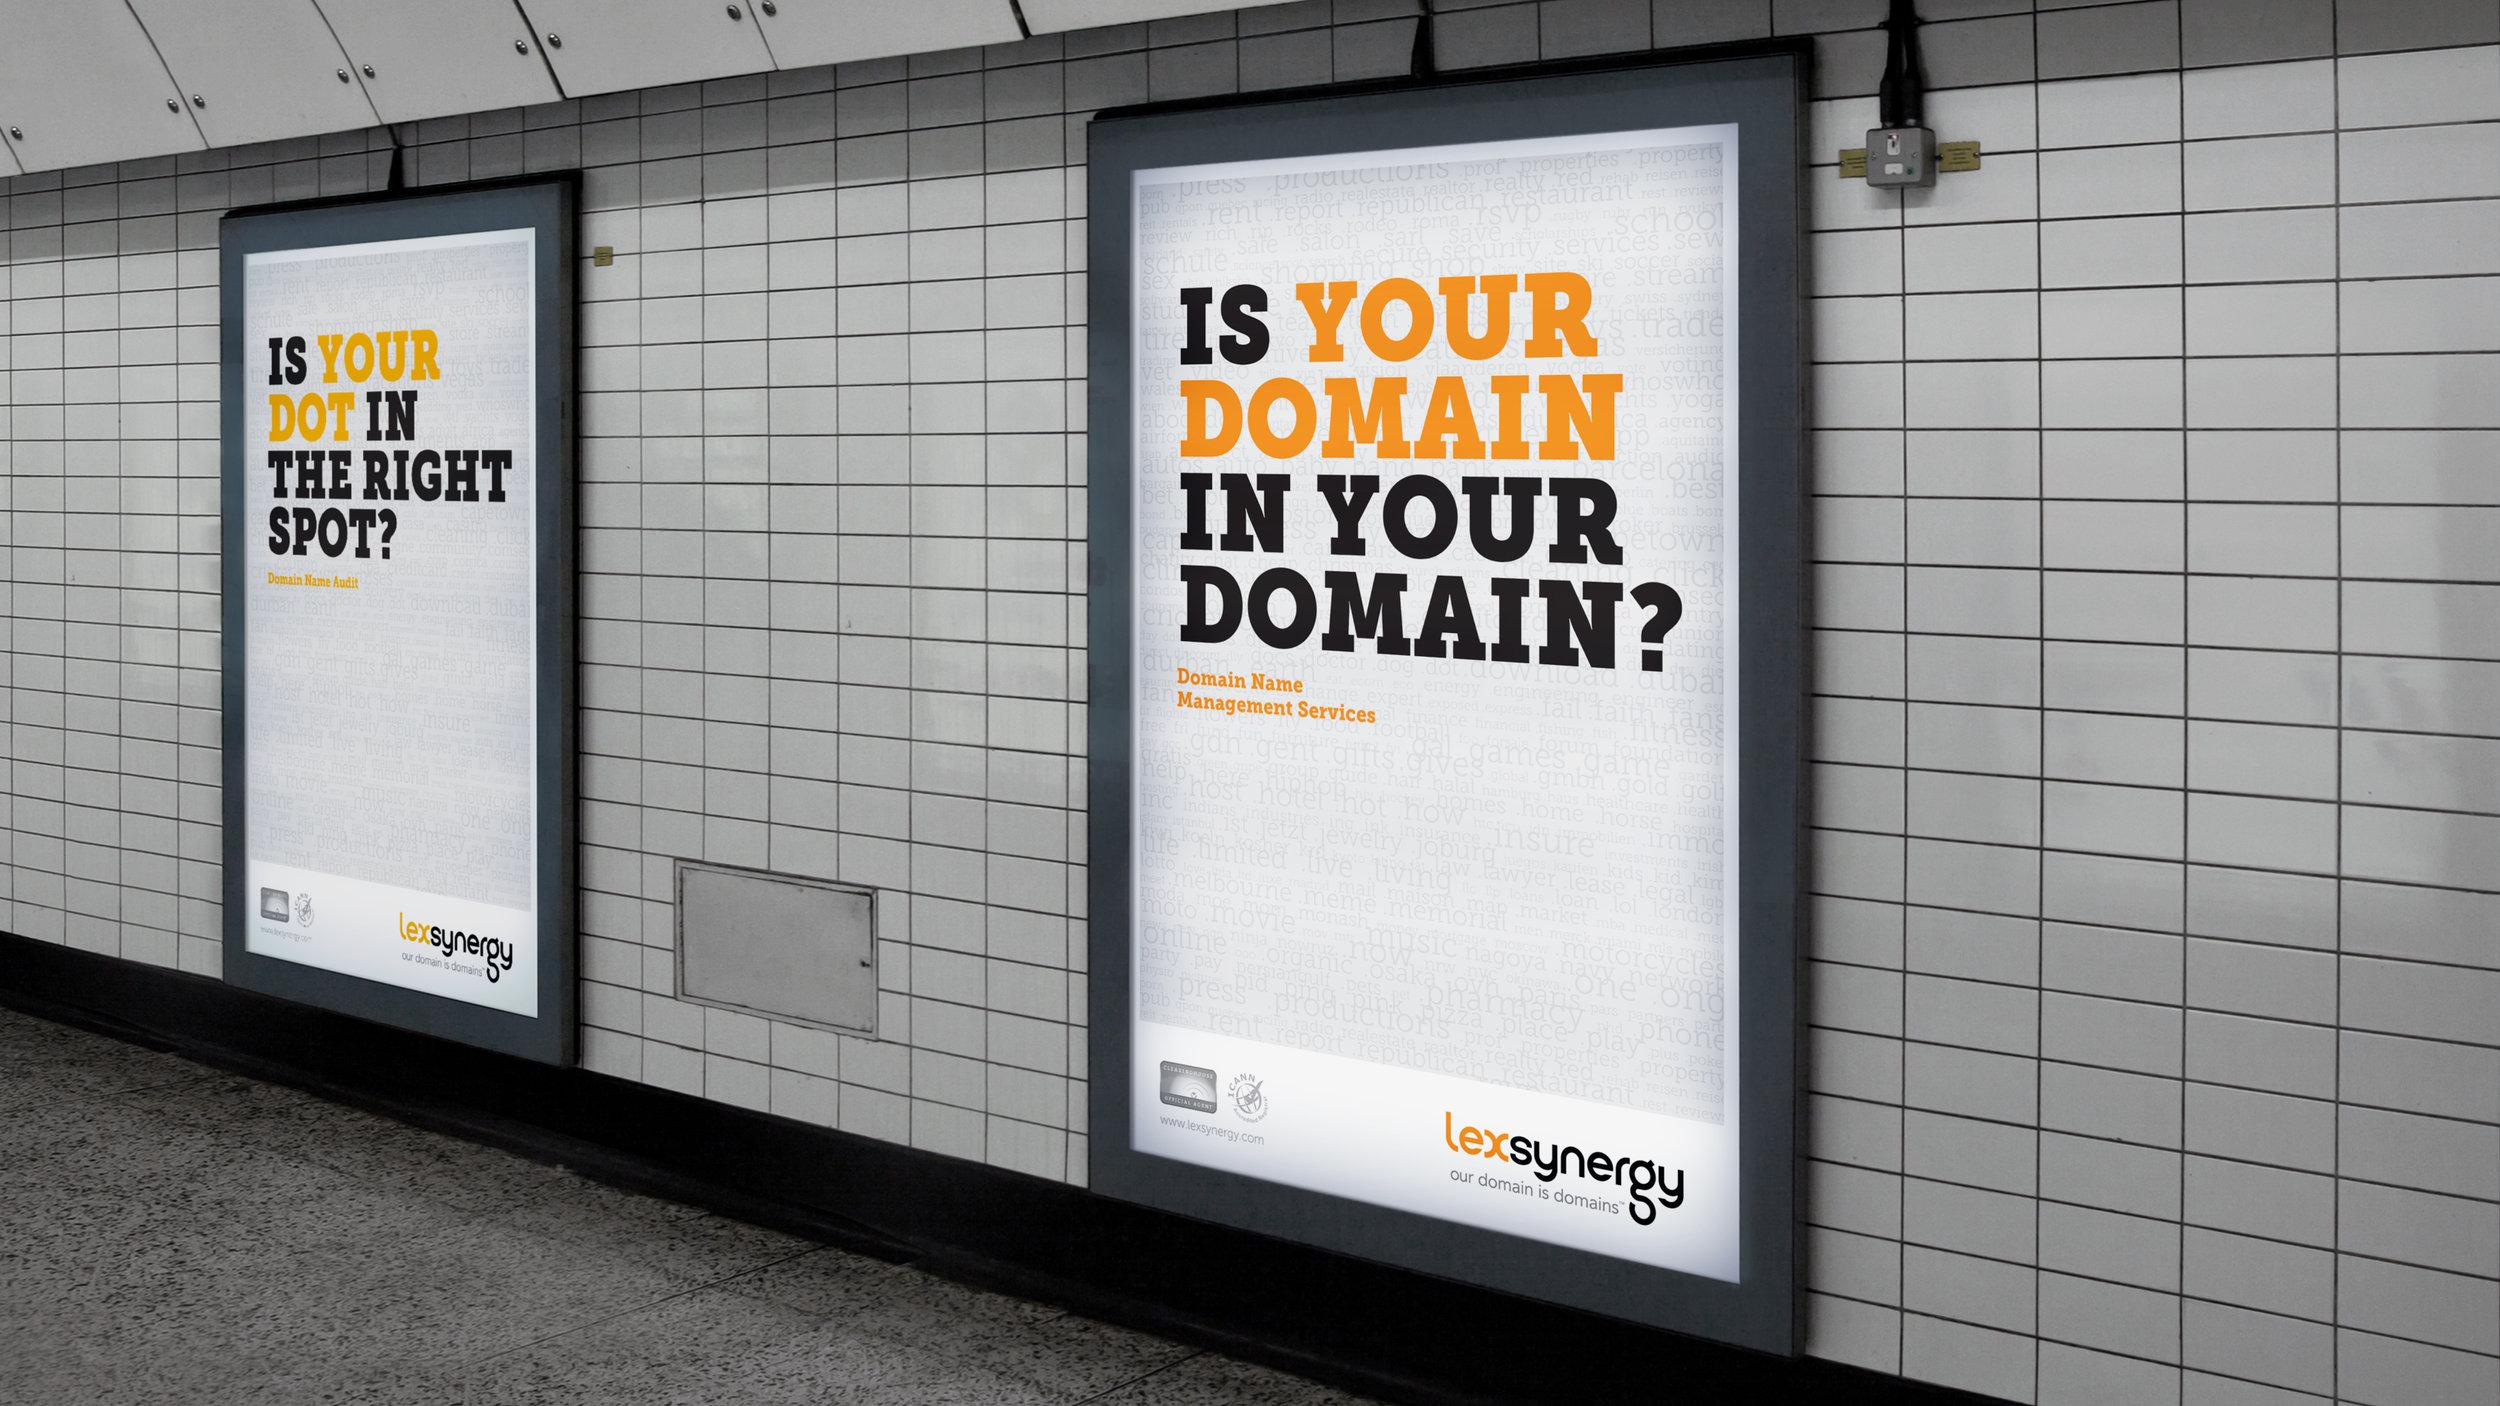 Brand_republica_advertising_campaign_lexsynergy_London_underground.jpg